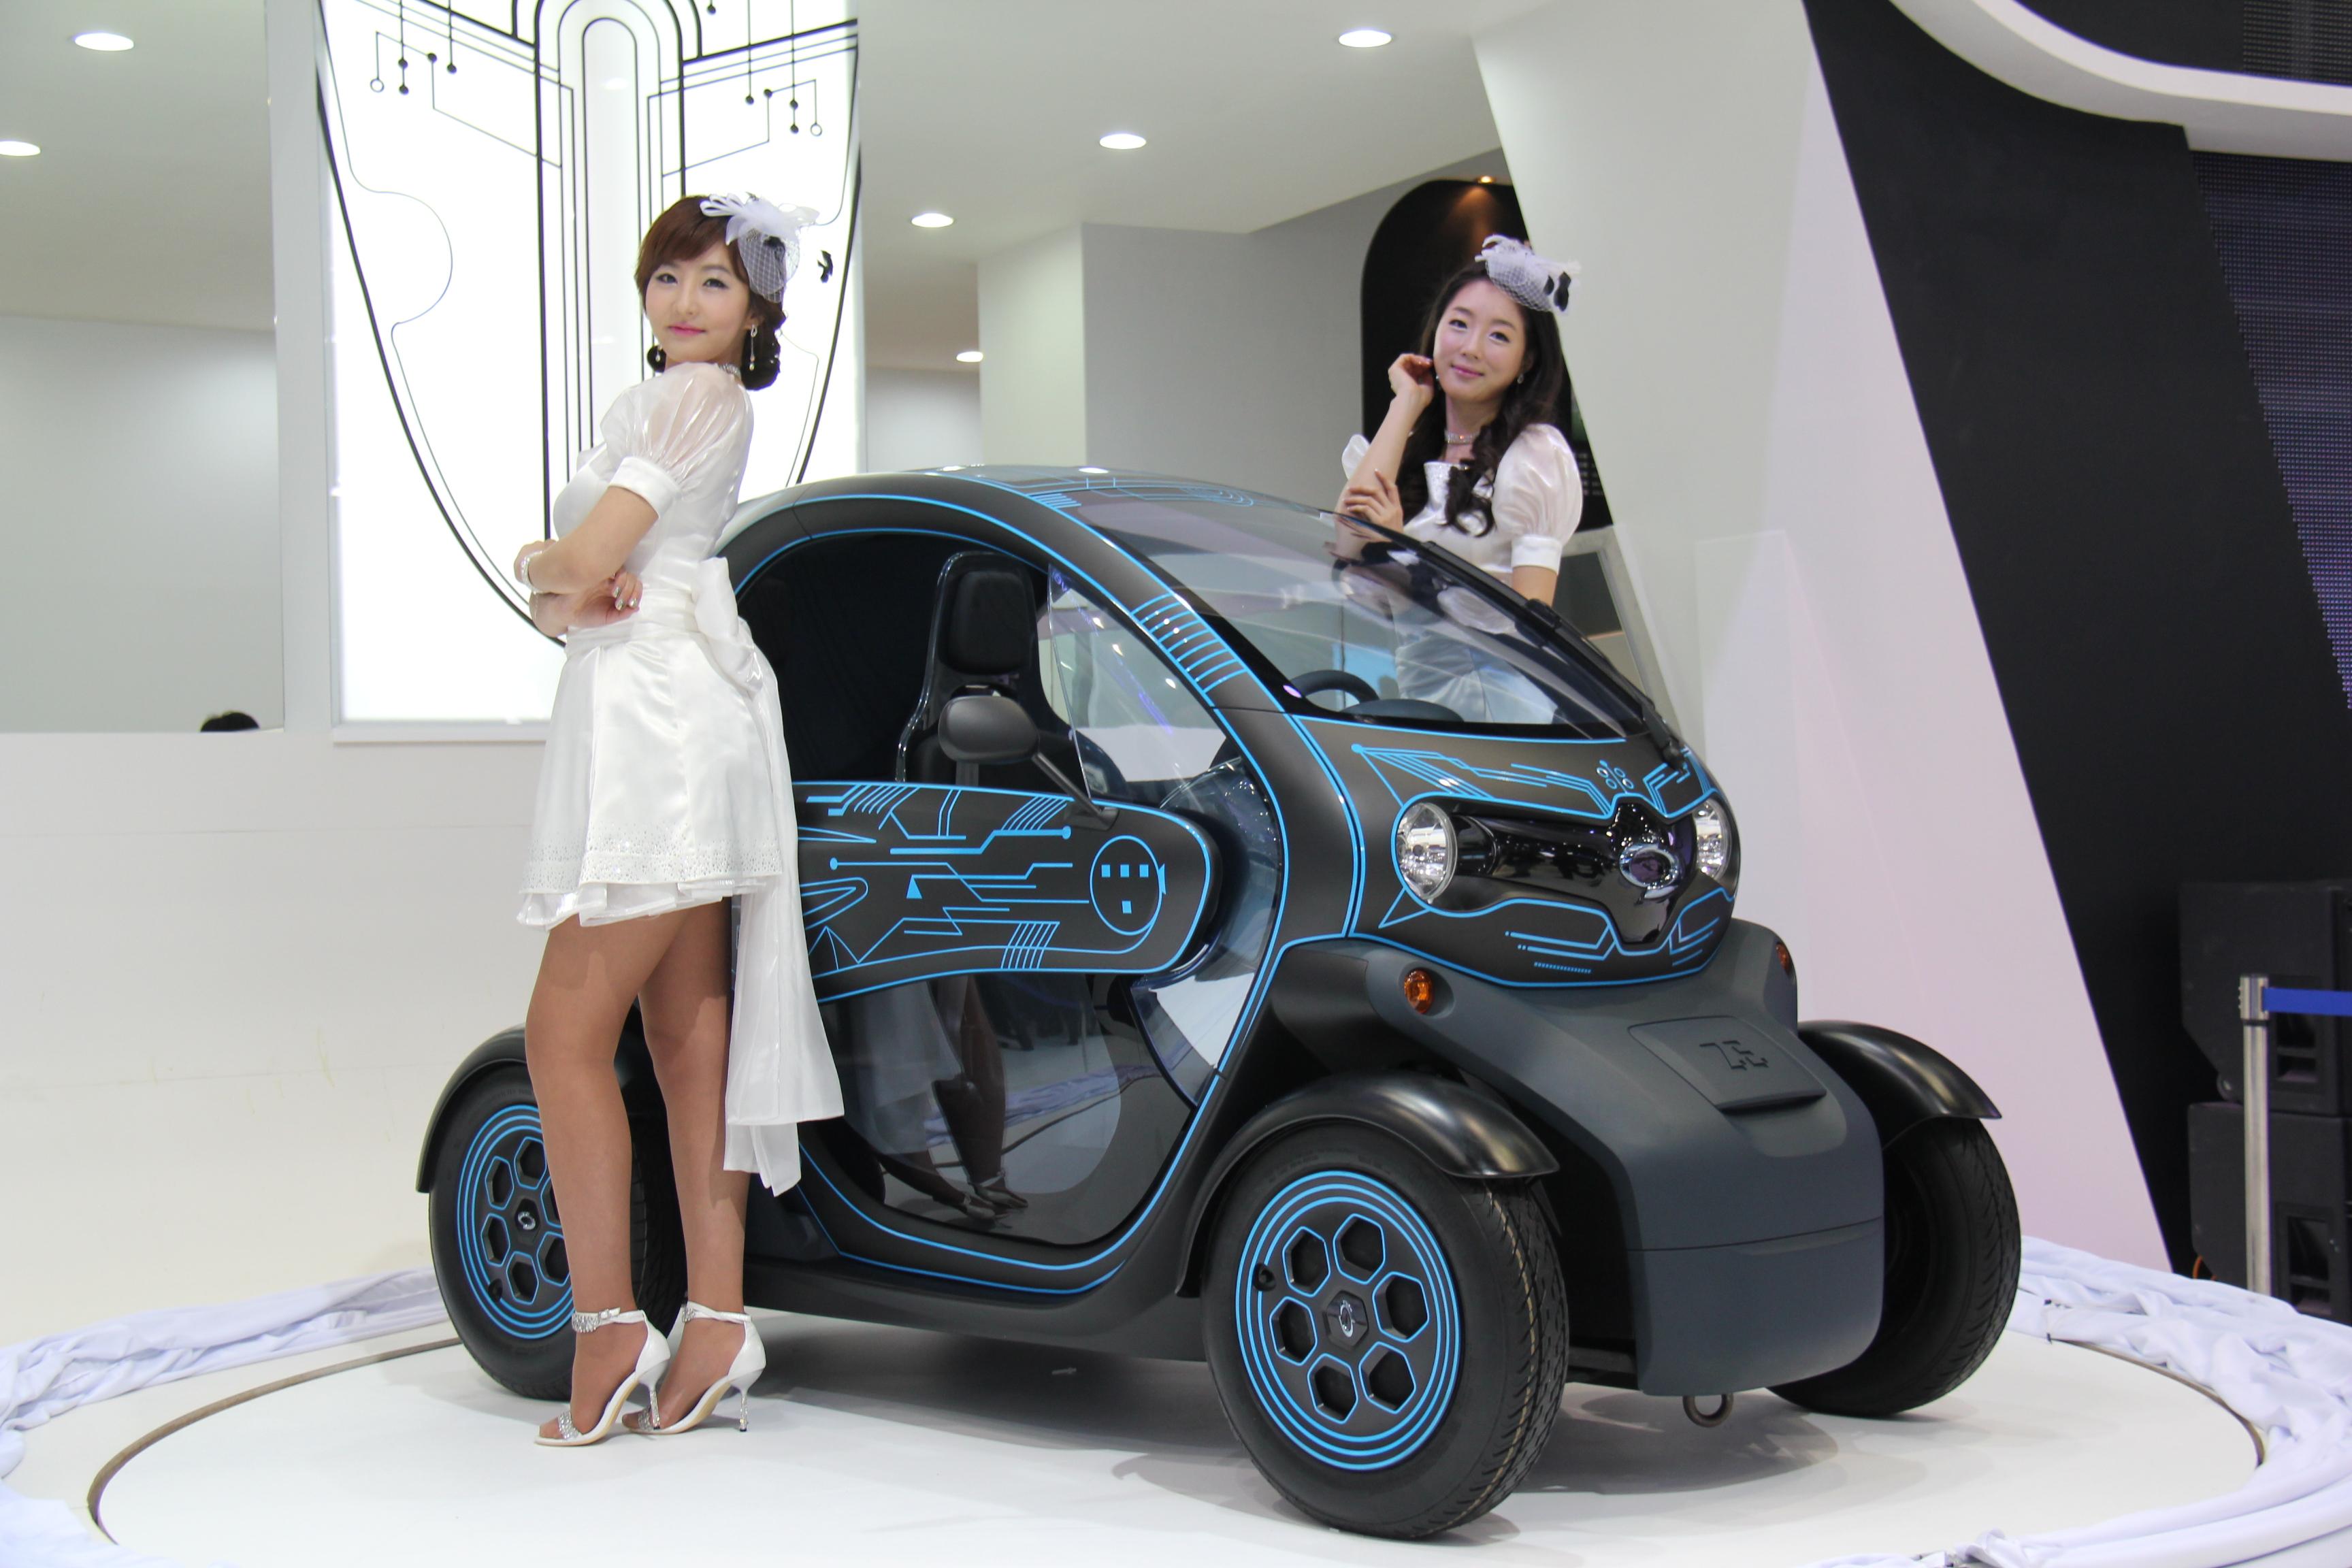 File:KOCIS 2011 Seoul Motor Show (5817570414).jpg